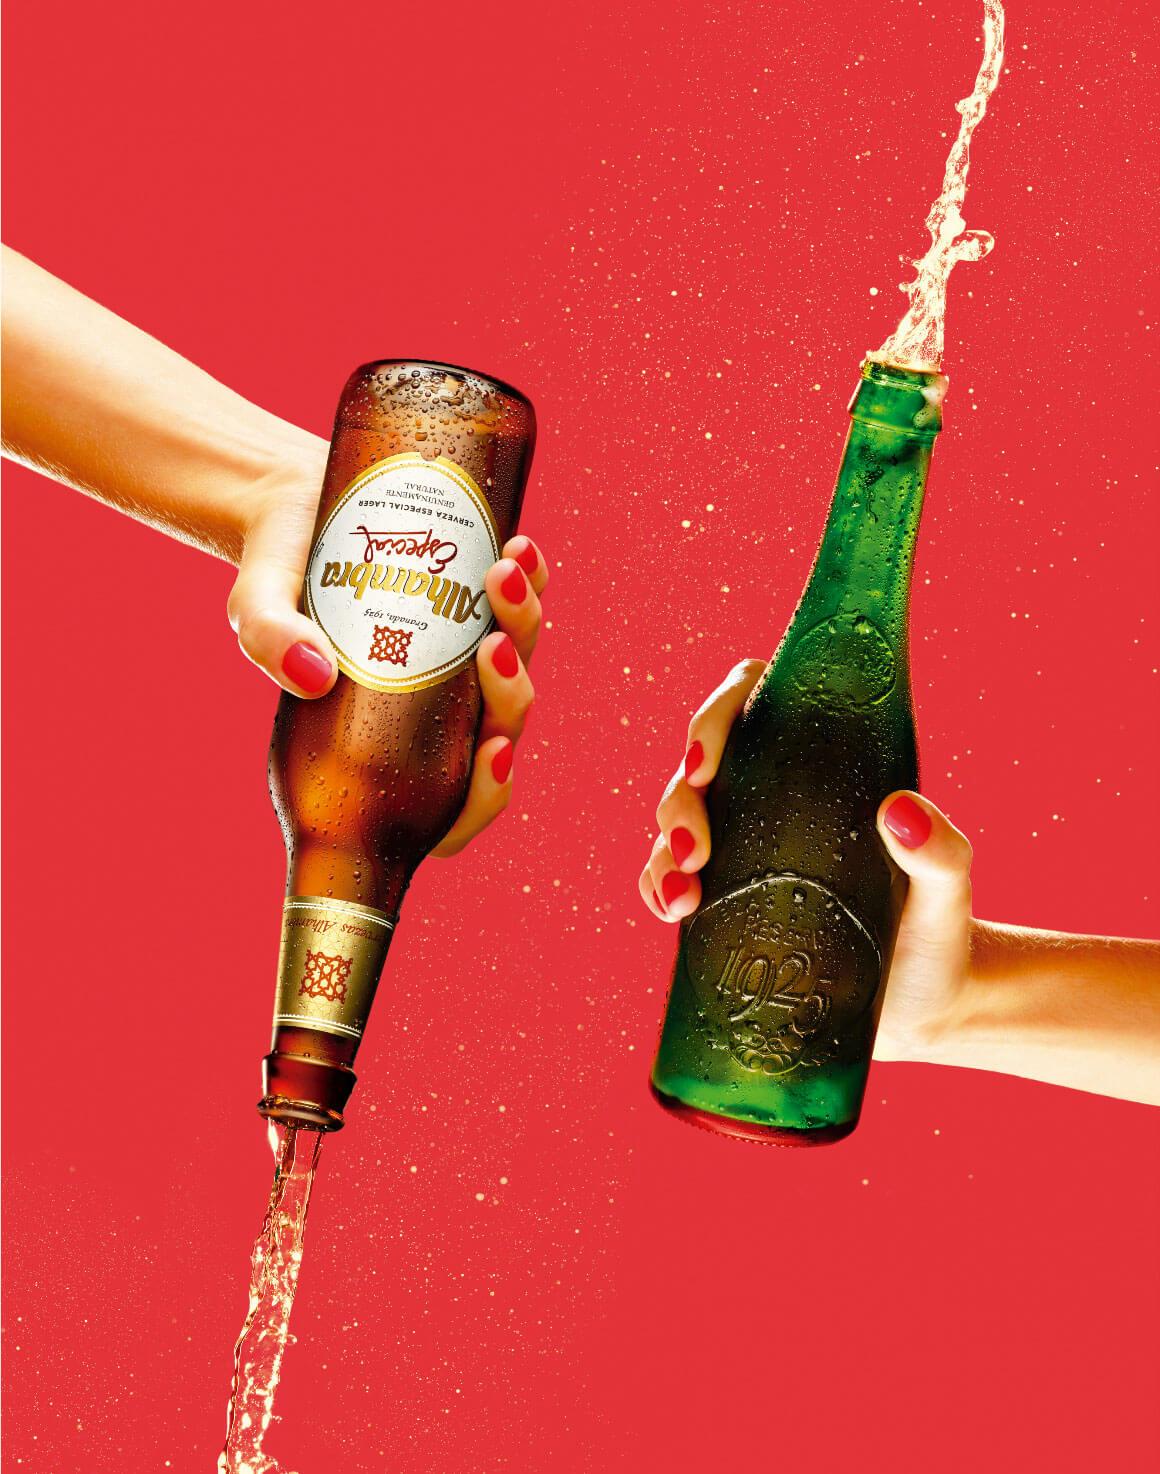 Momentos Alhambra - A Mano, de Pierpaolo - Cervezas Alhambra